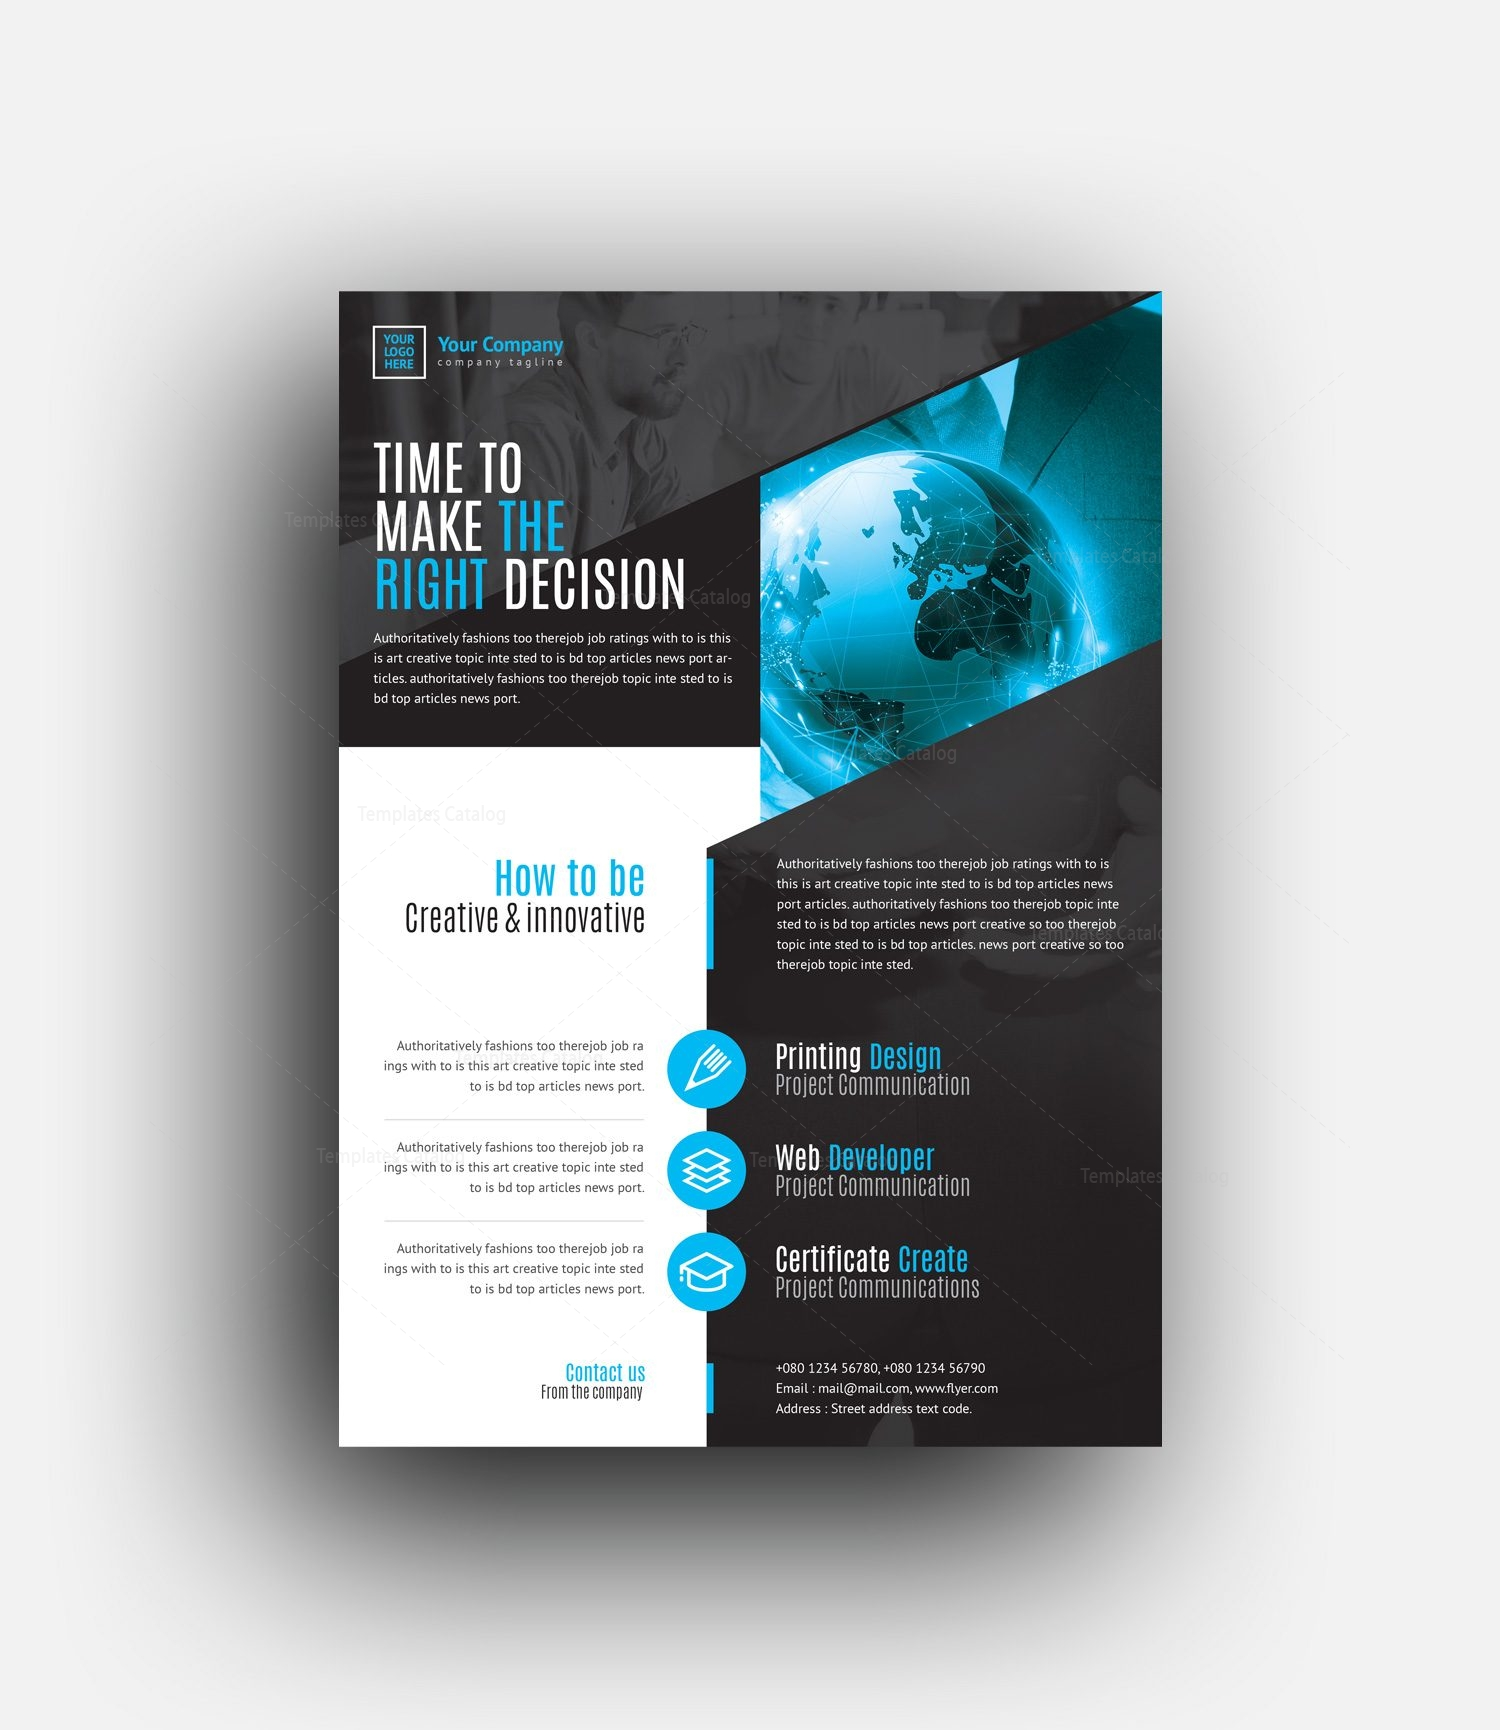 Professional Flyer Design Templates: Morpheus Professional Corporate Flyer Template 0010003